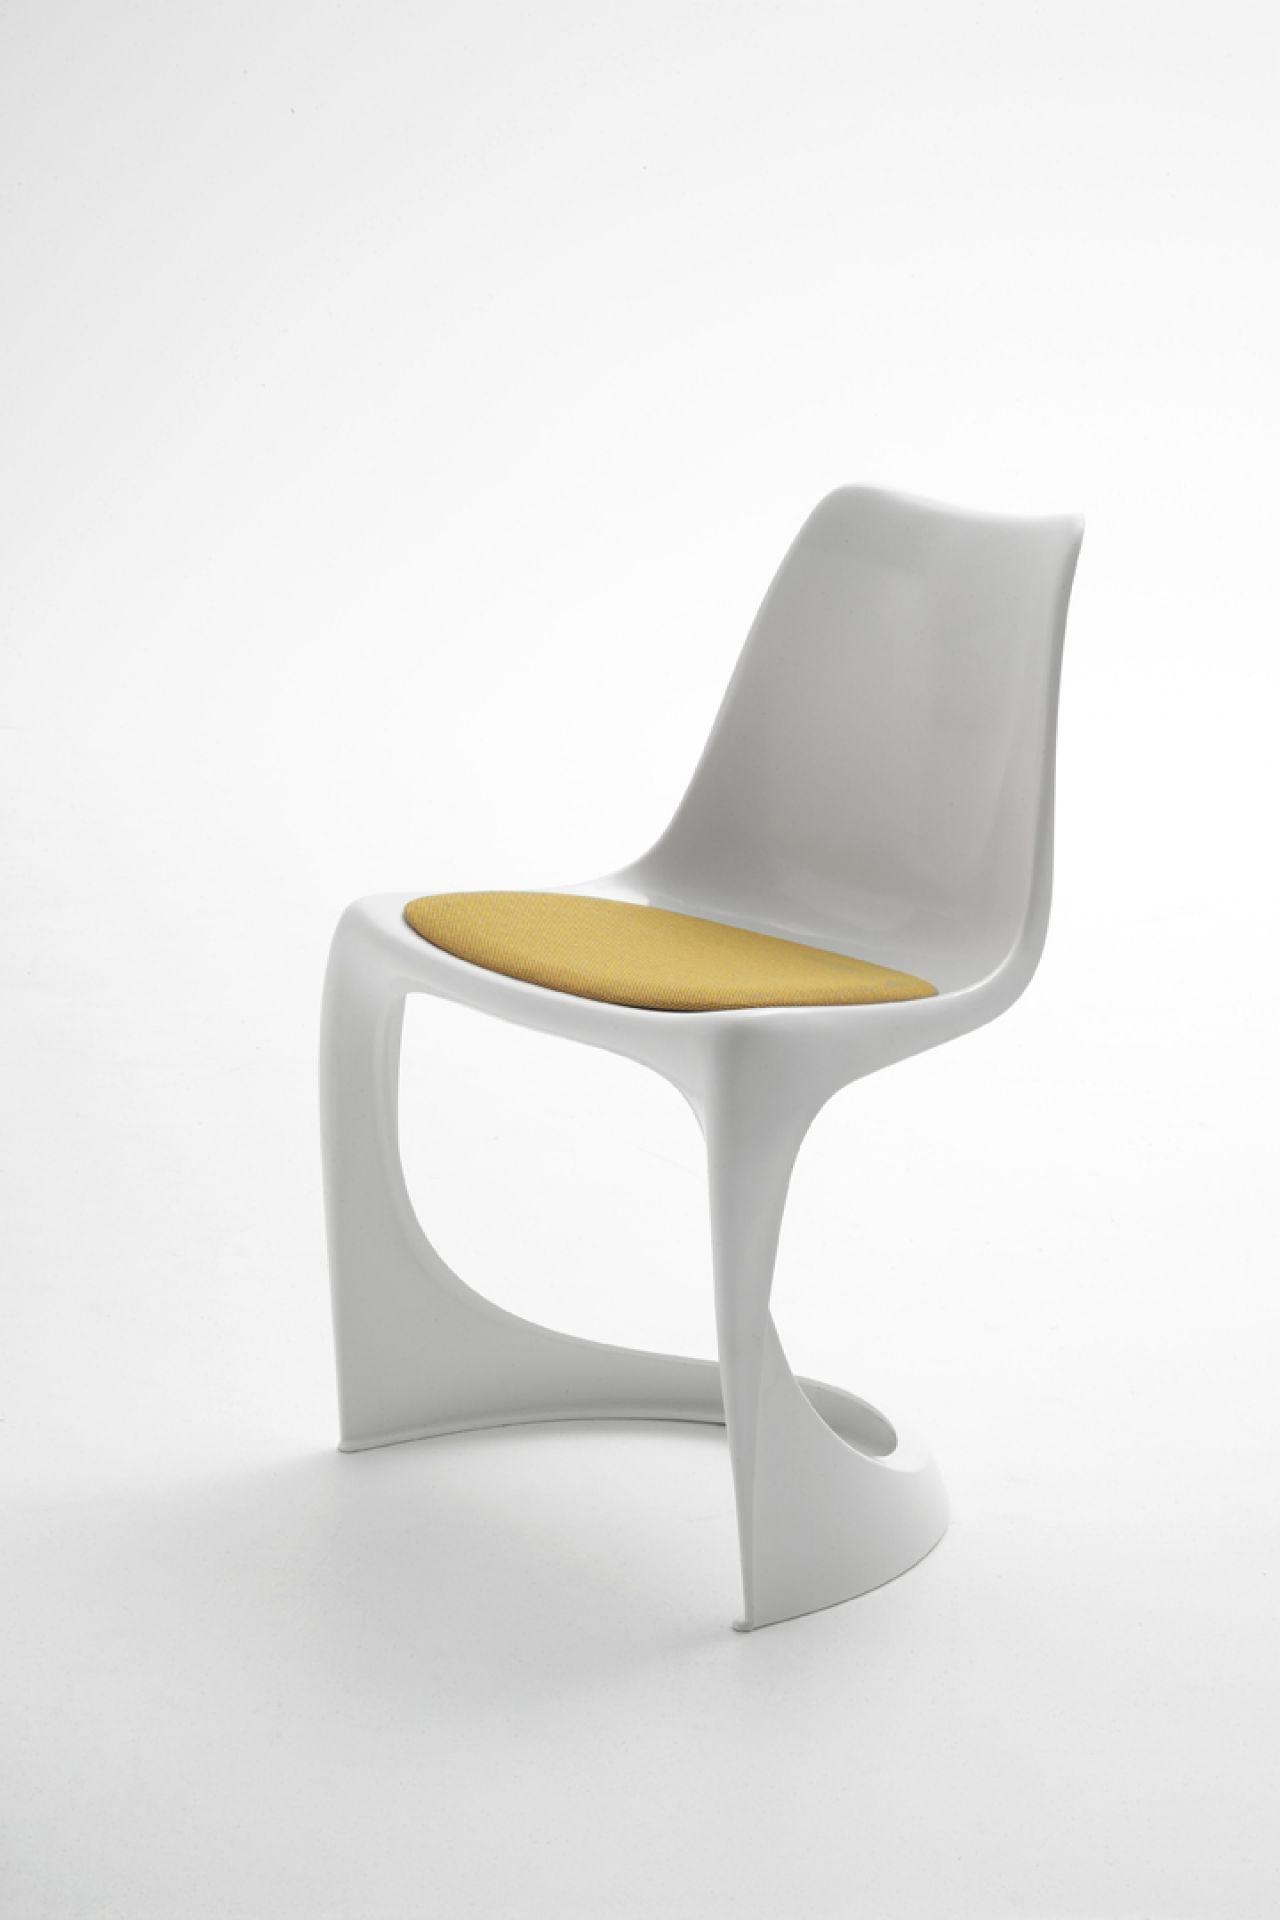 4er Set 290 Dining Chair Stuhl Nielaus